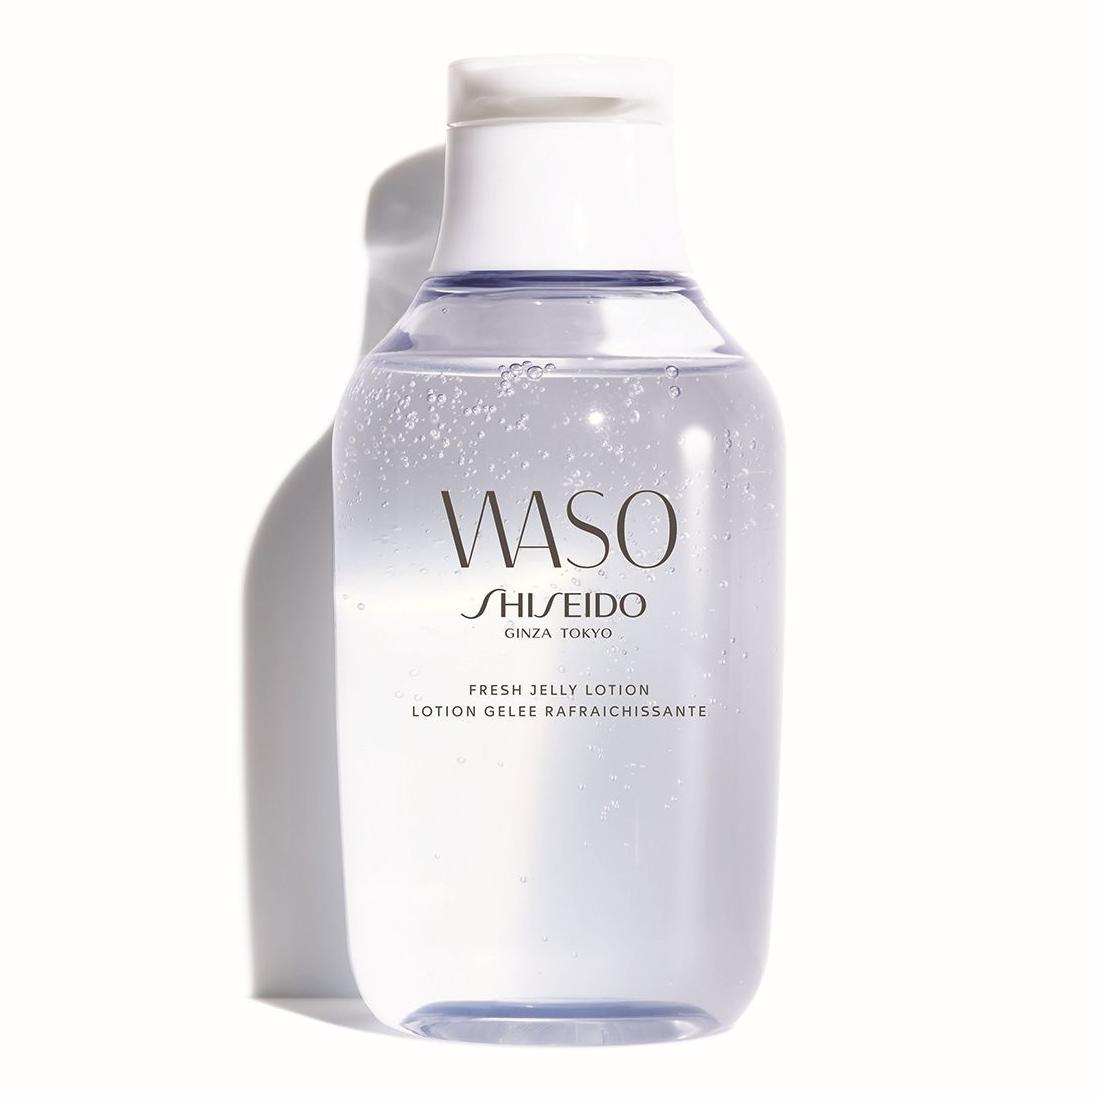 Waso Lotion Gelée Fraîche - Shiseido